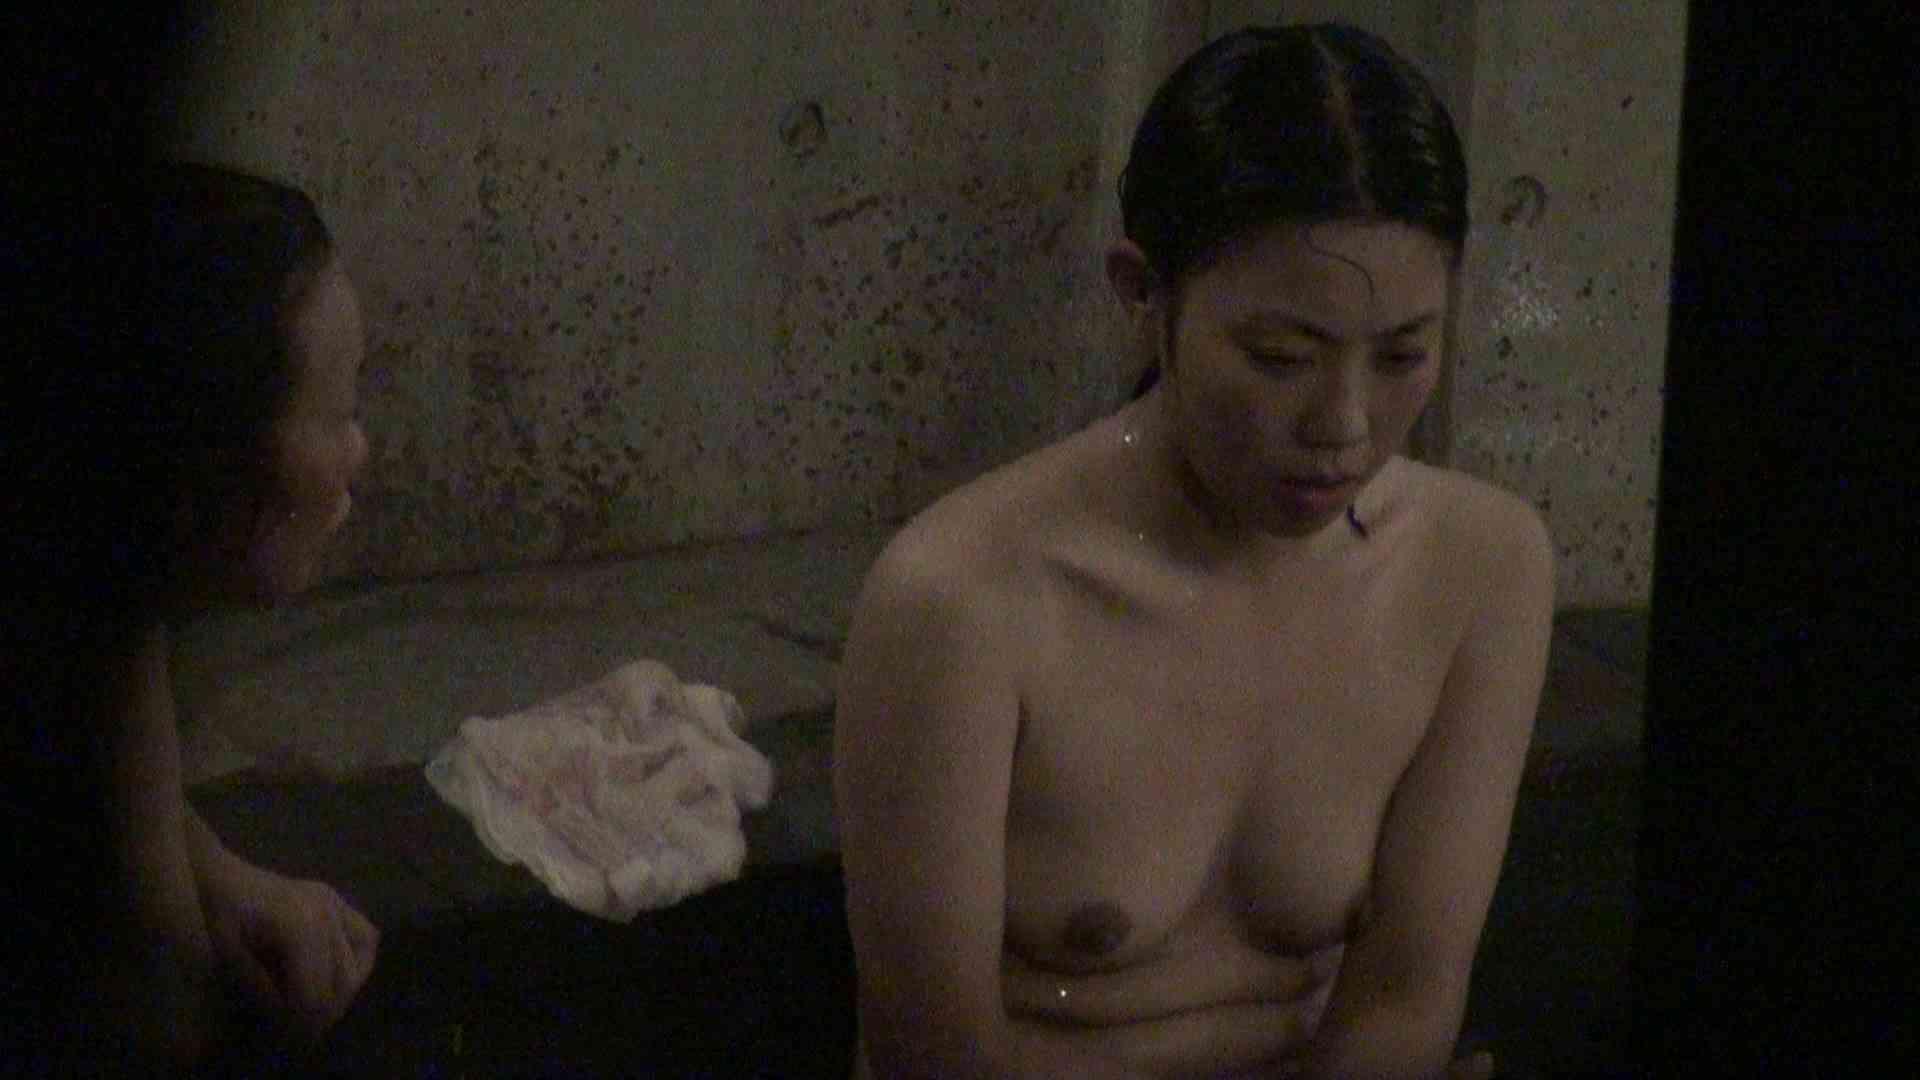 Aquaな露天風呂Vol.330 OLのエロ生活 | 露天風呂  101連発 19